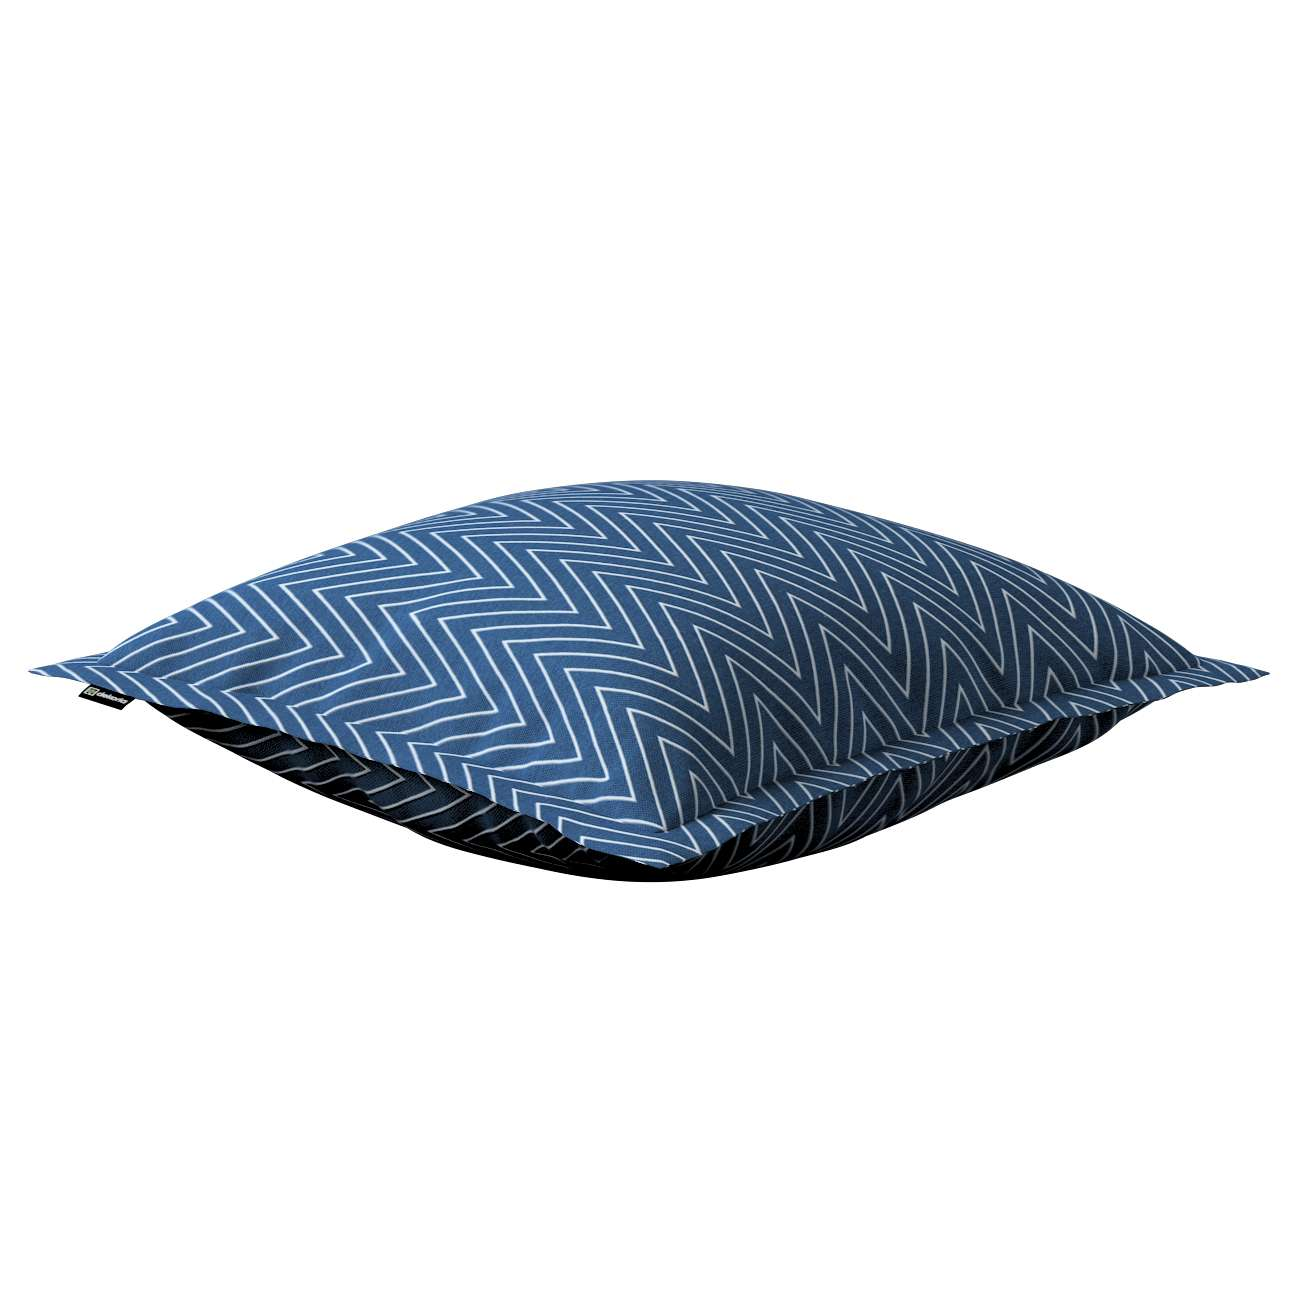 Poszewka Mona na poduszkę 38x38 cm w kolekcji Brooklyn, tkanina: 137-88